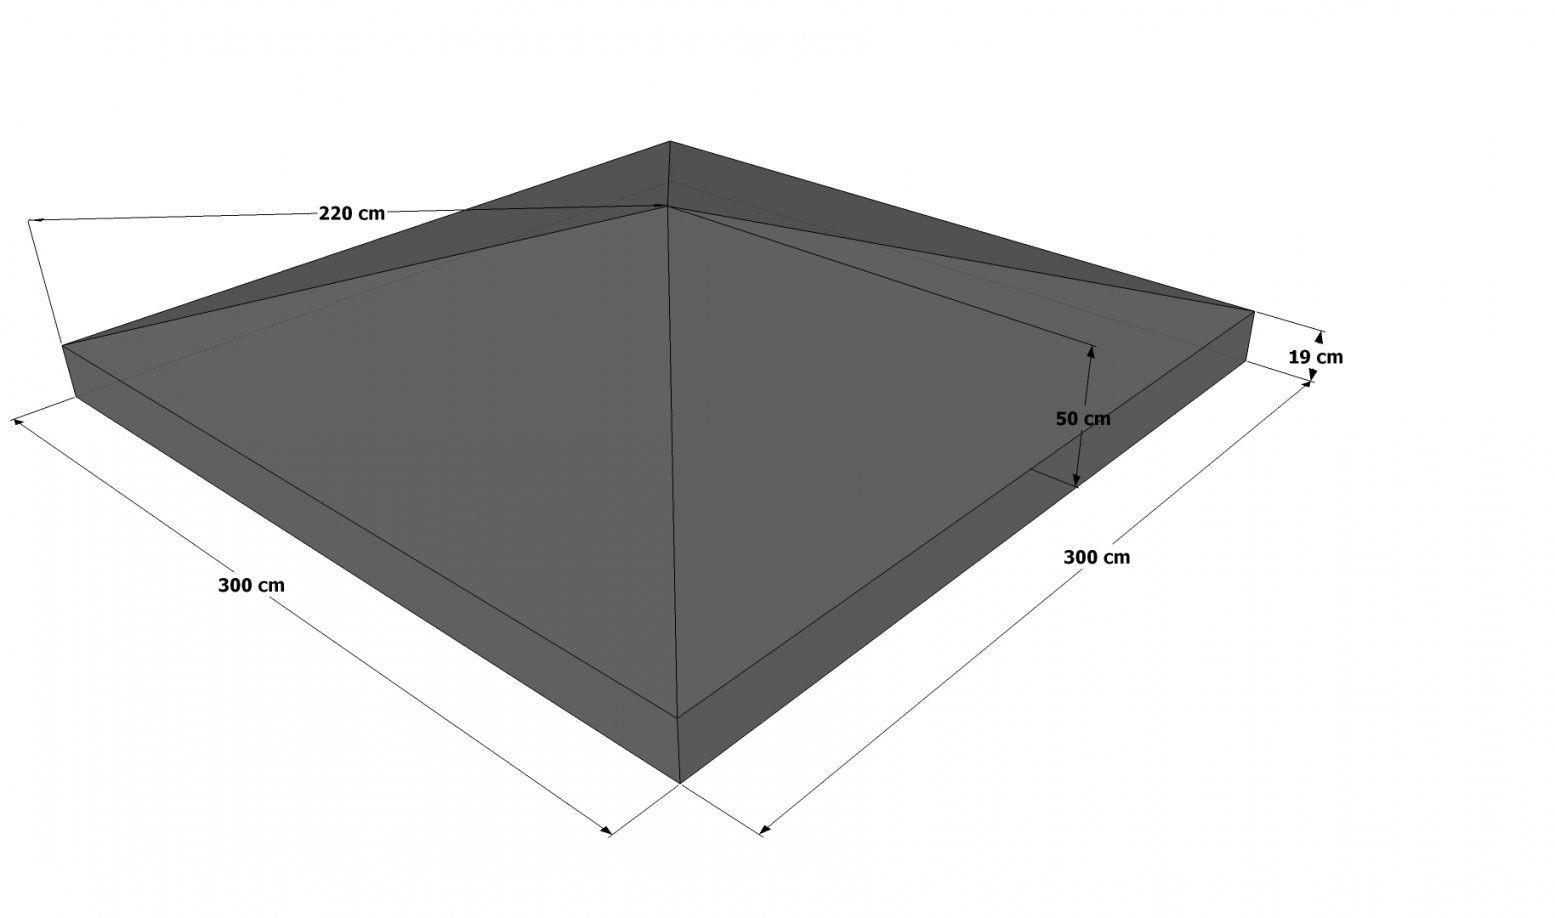 Ersatzdach Ersatzdach Dubai Markise Grau Neu U Ovp With Ersatzdach von Pavillon Ersatzdach 3X3 Wasserdicht Bild